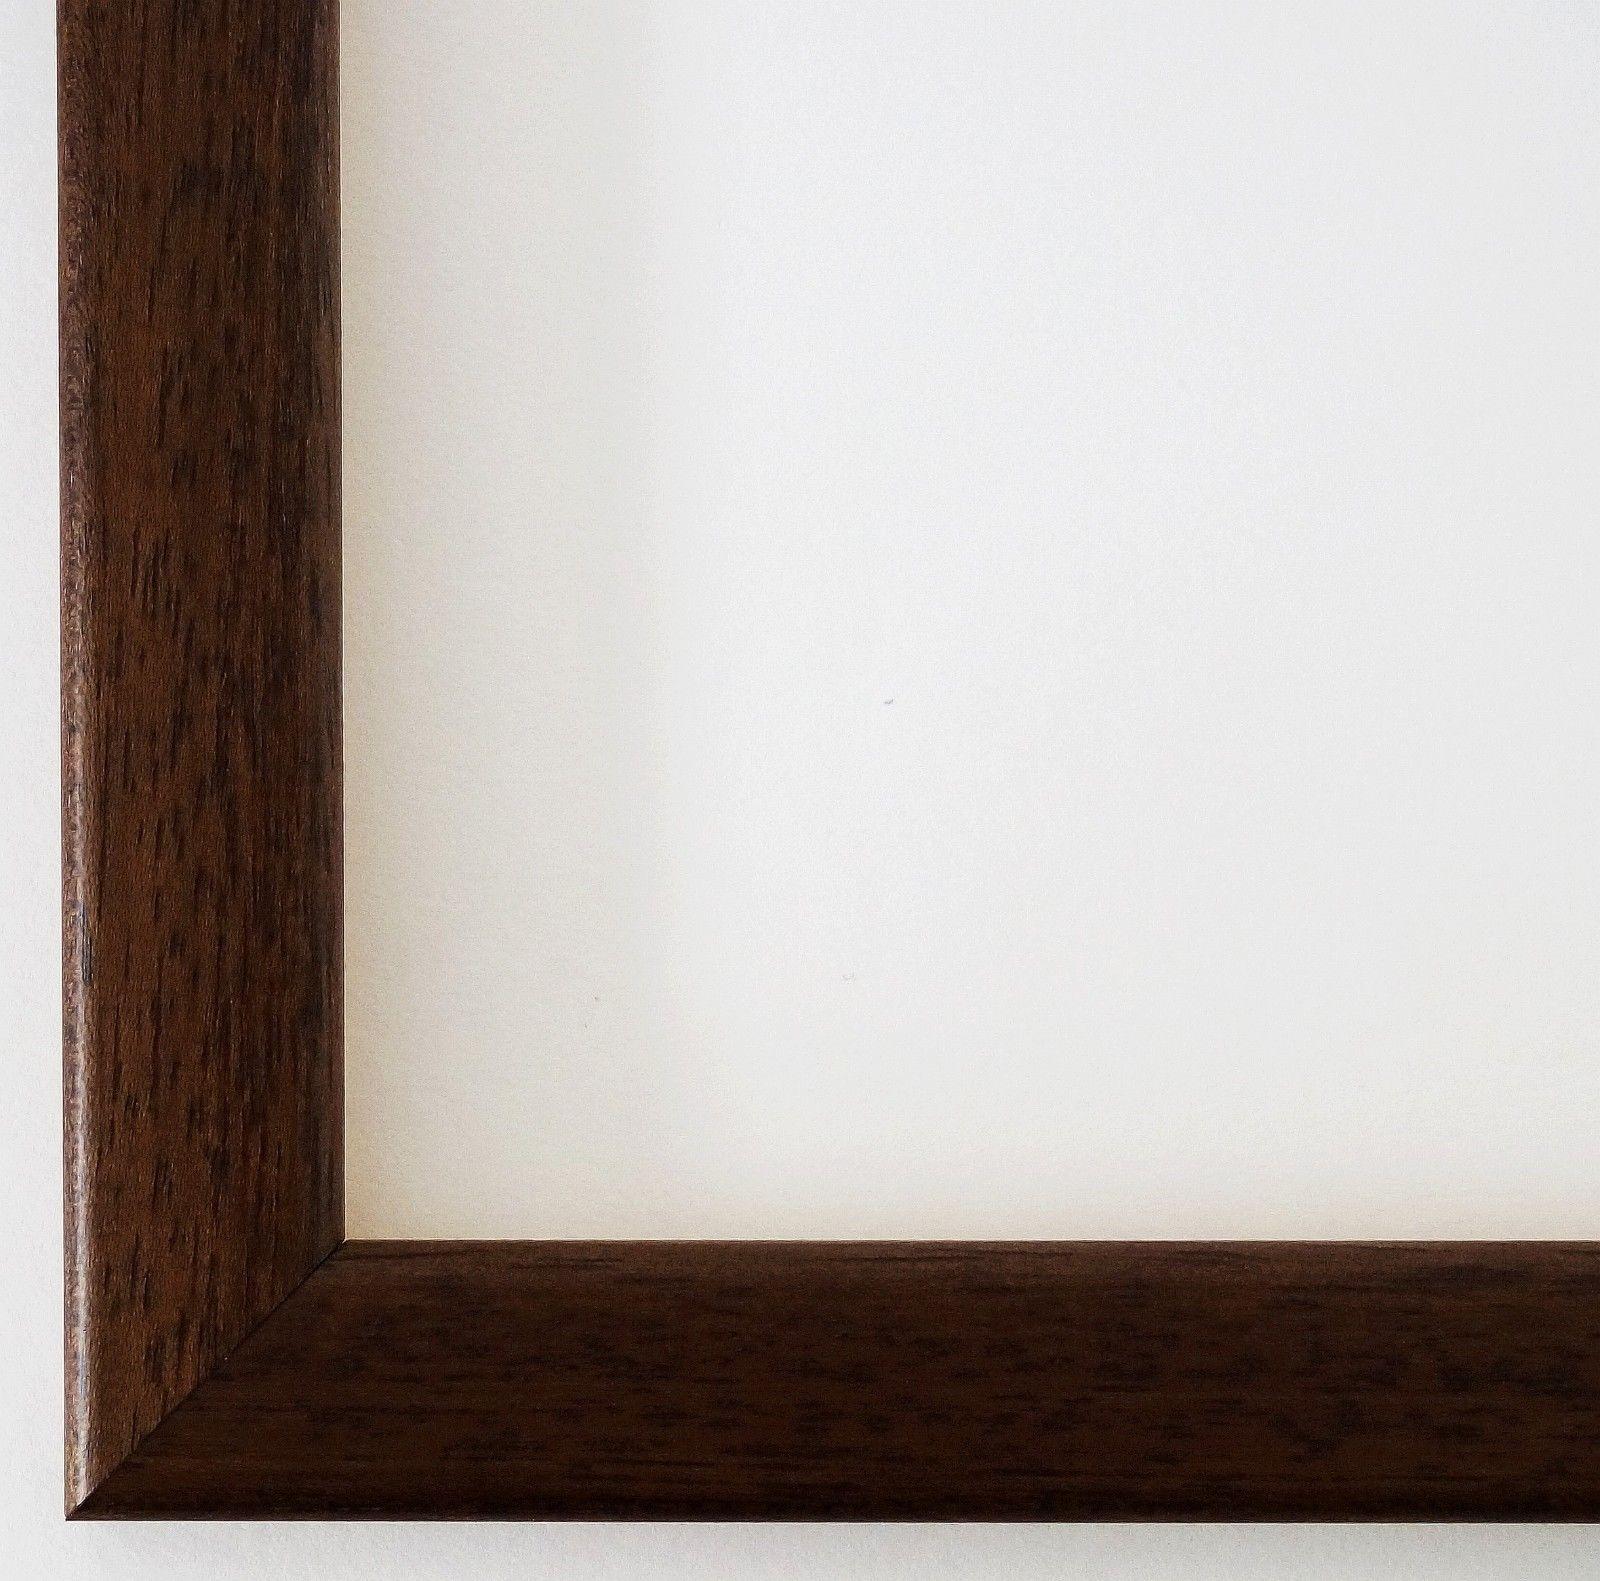 Bilderrahmen Braun Modern Art Deco Rahmen Holz Hannover 2, 4 - alle ...